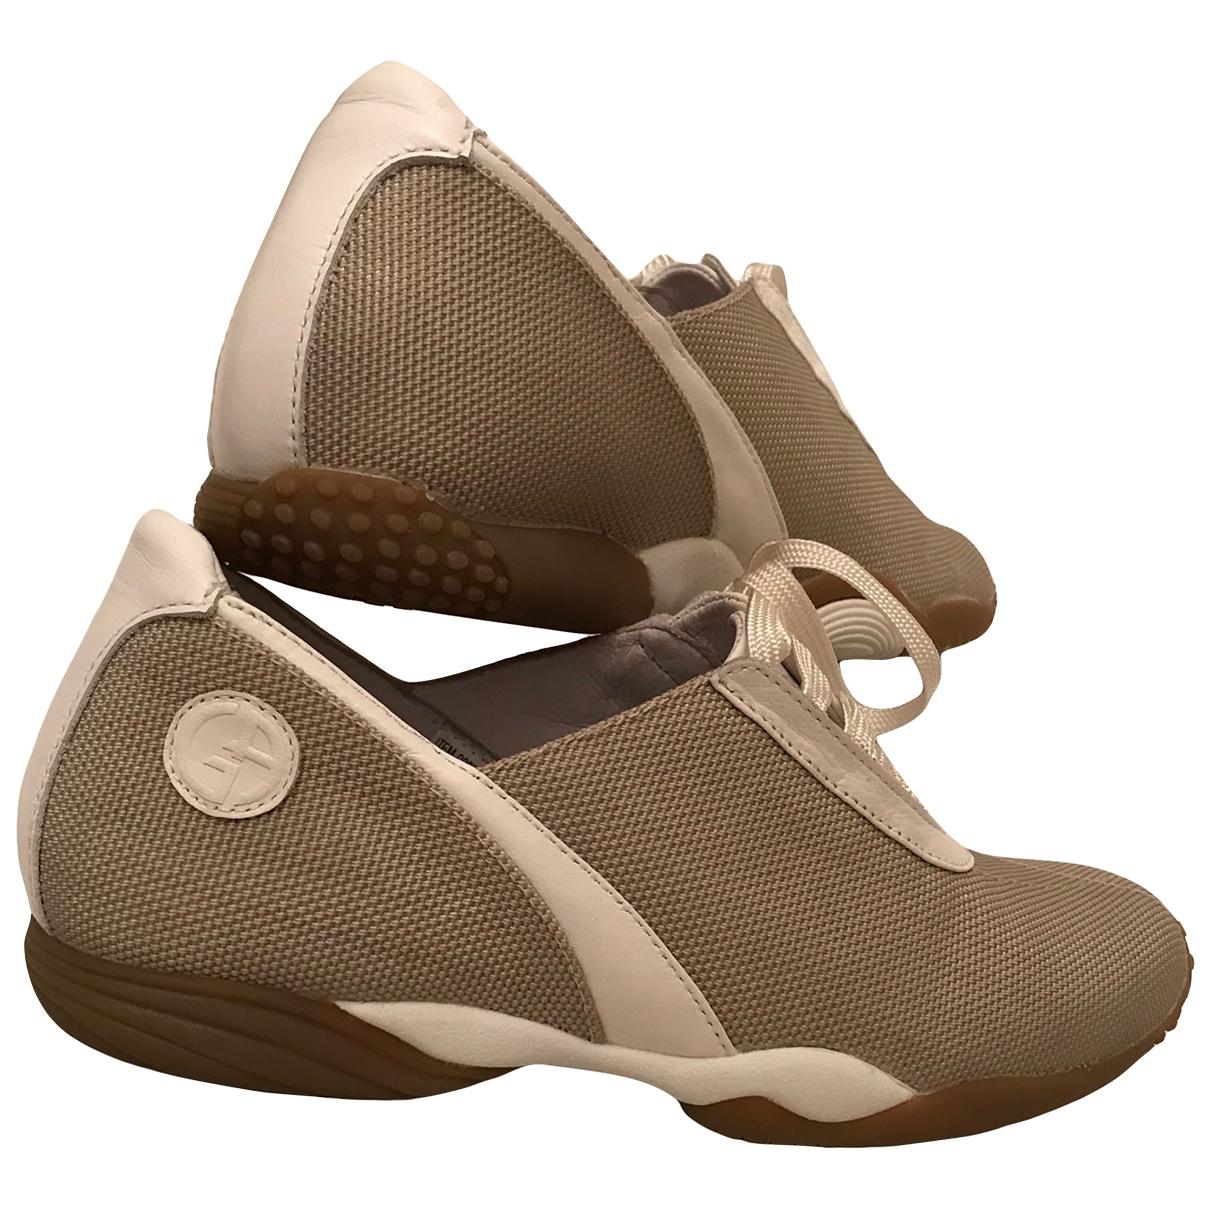 Giorgio Armani - Baskets   pour femme en toile - beige